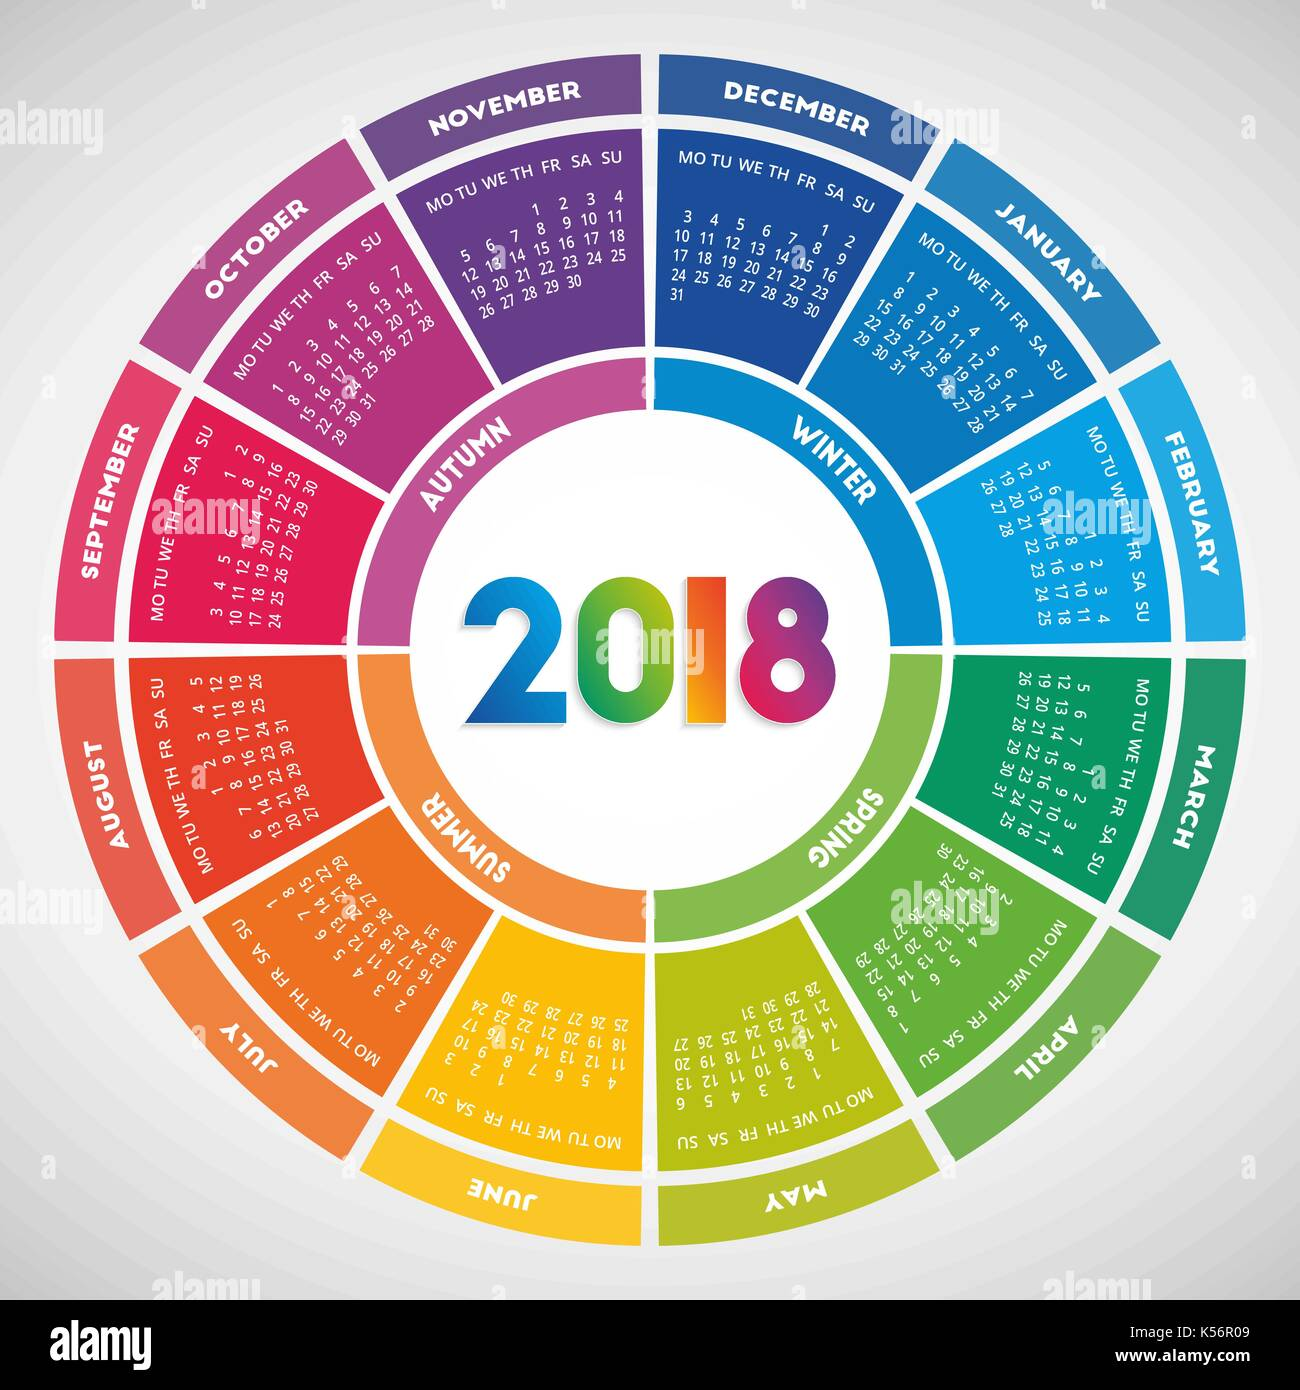 Year Round Calendar Template : Colorful round calendar design week starts on monday